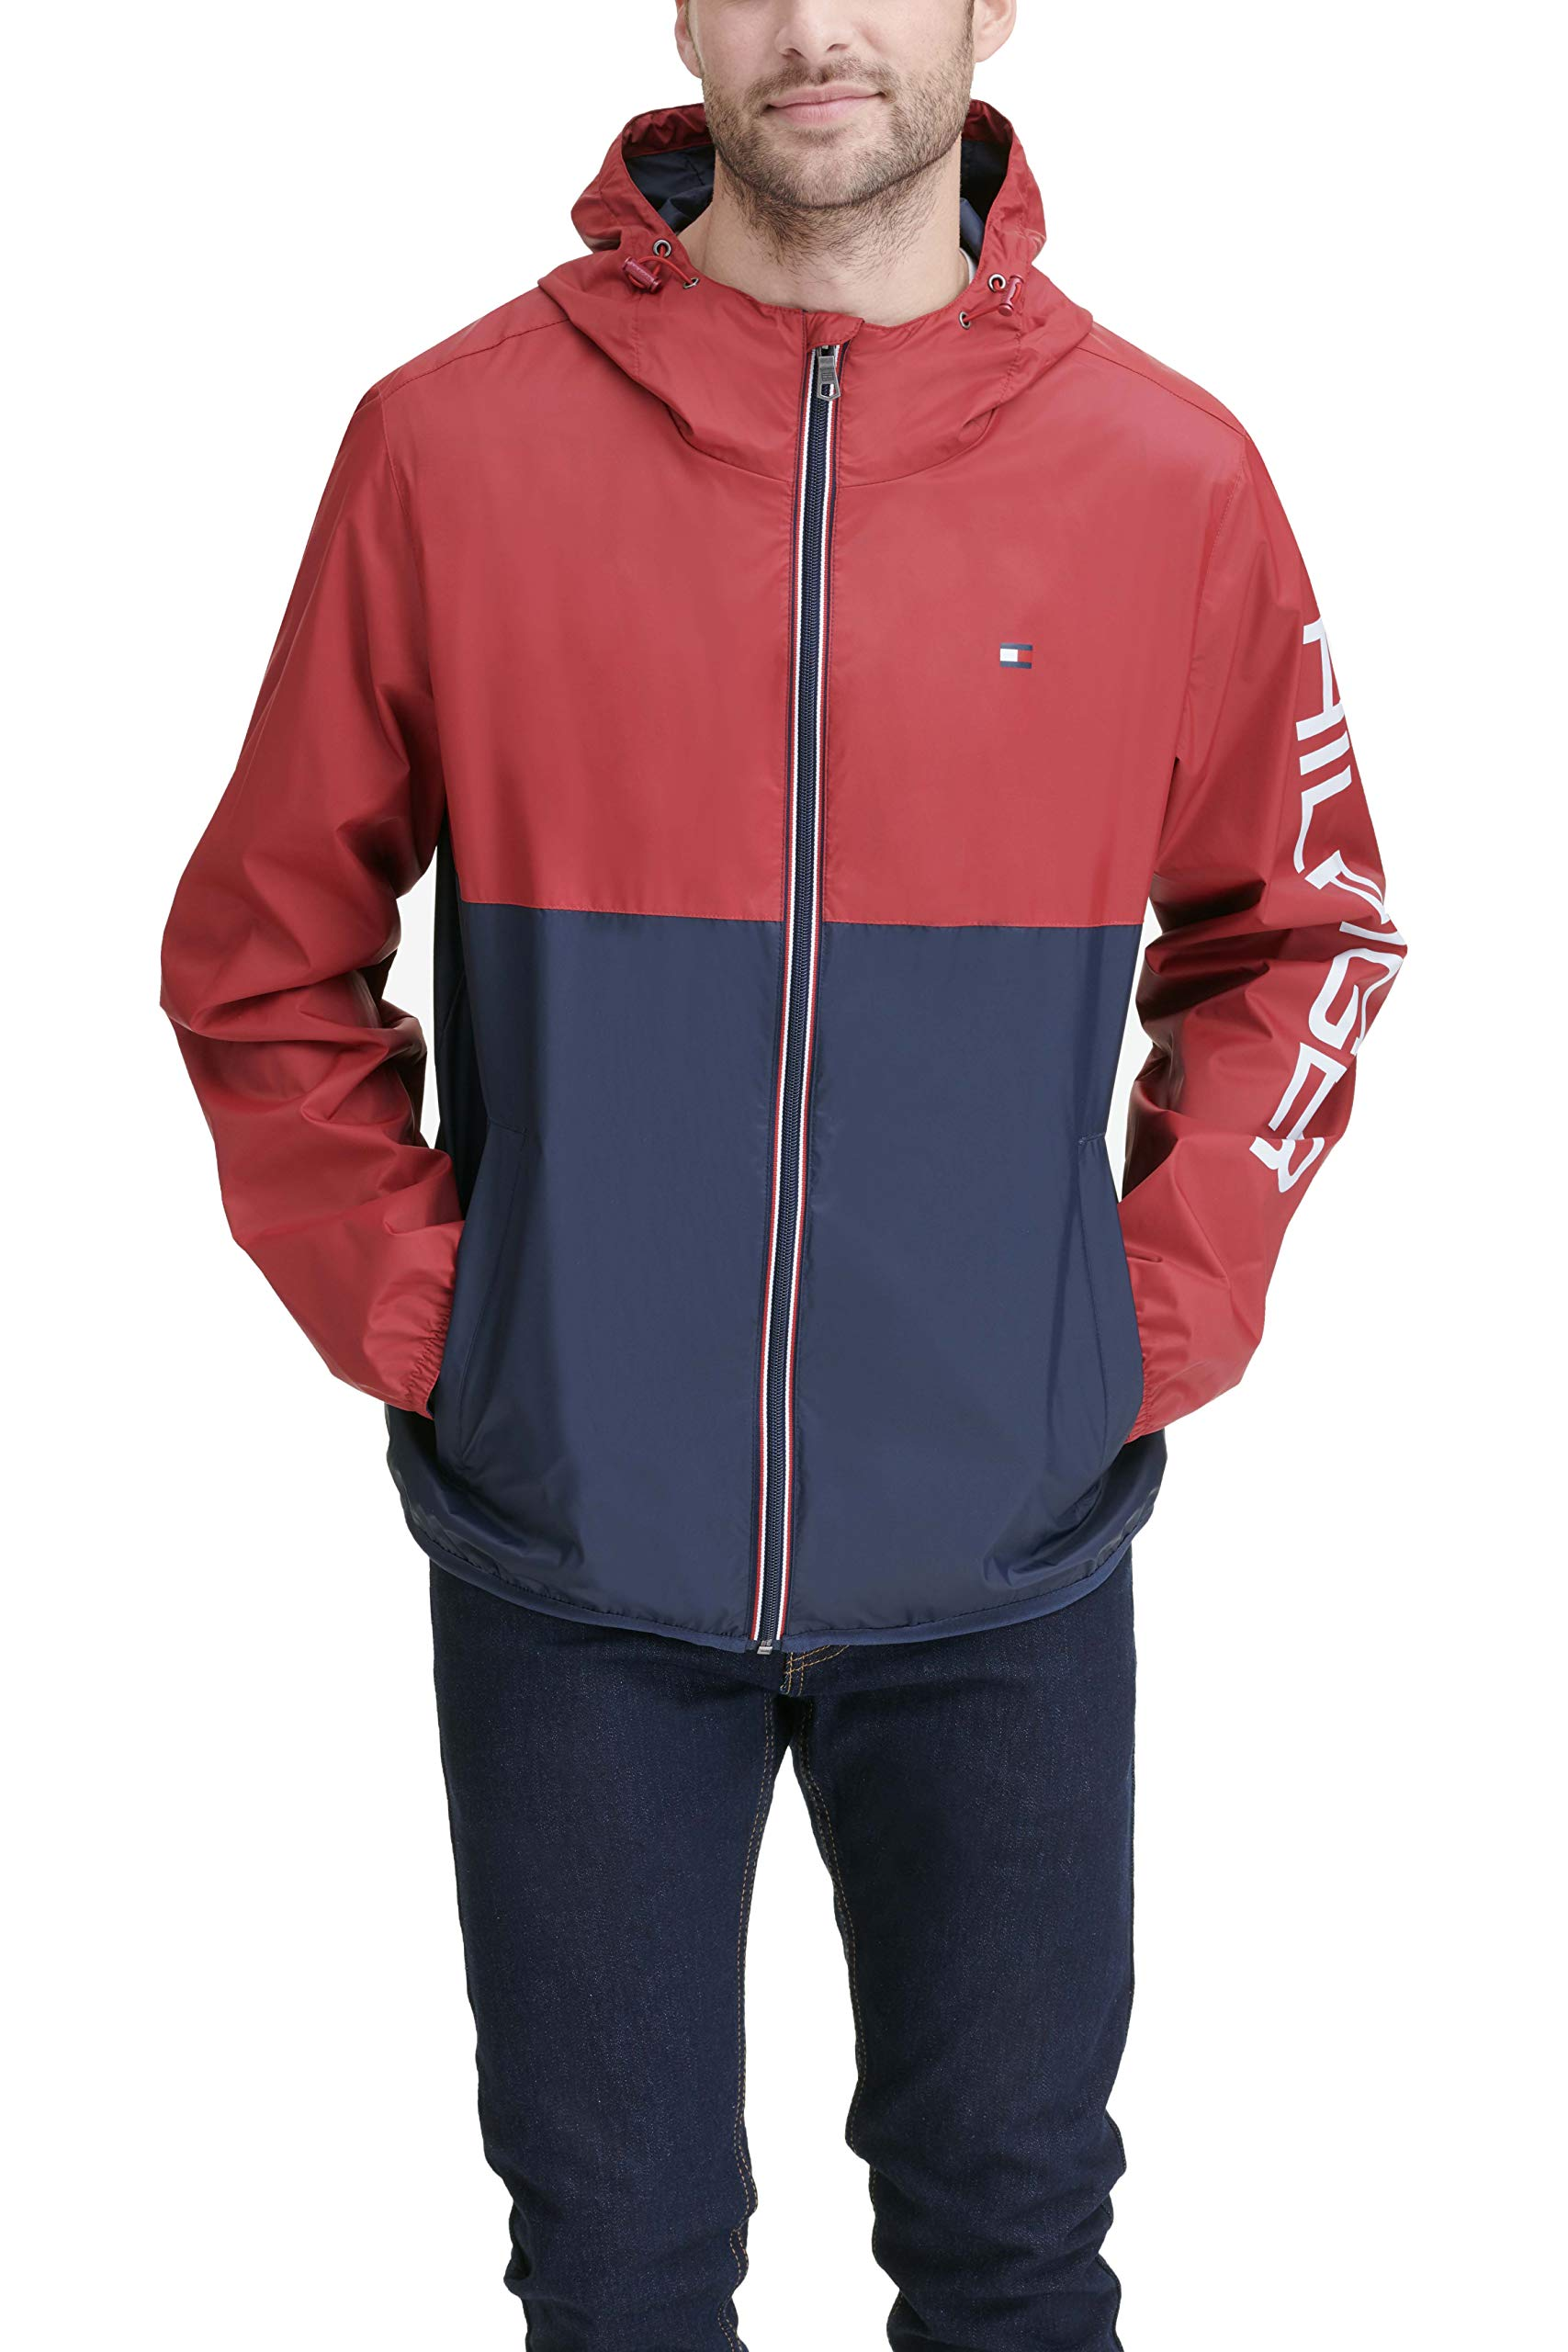 Tommy Hilfiger Men's Color Blocked Logo Rain Slicker Jacket, red/navy, MEDIUM by Tommy Hilfiger